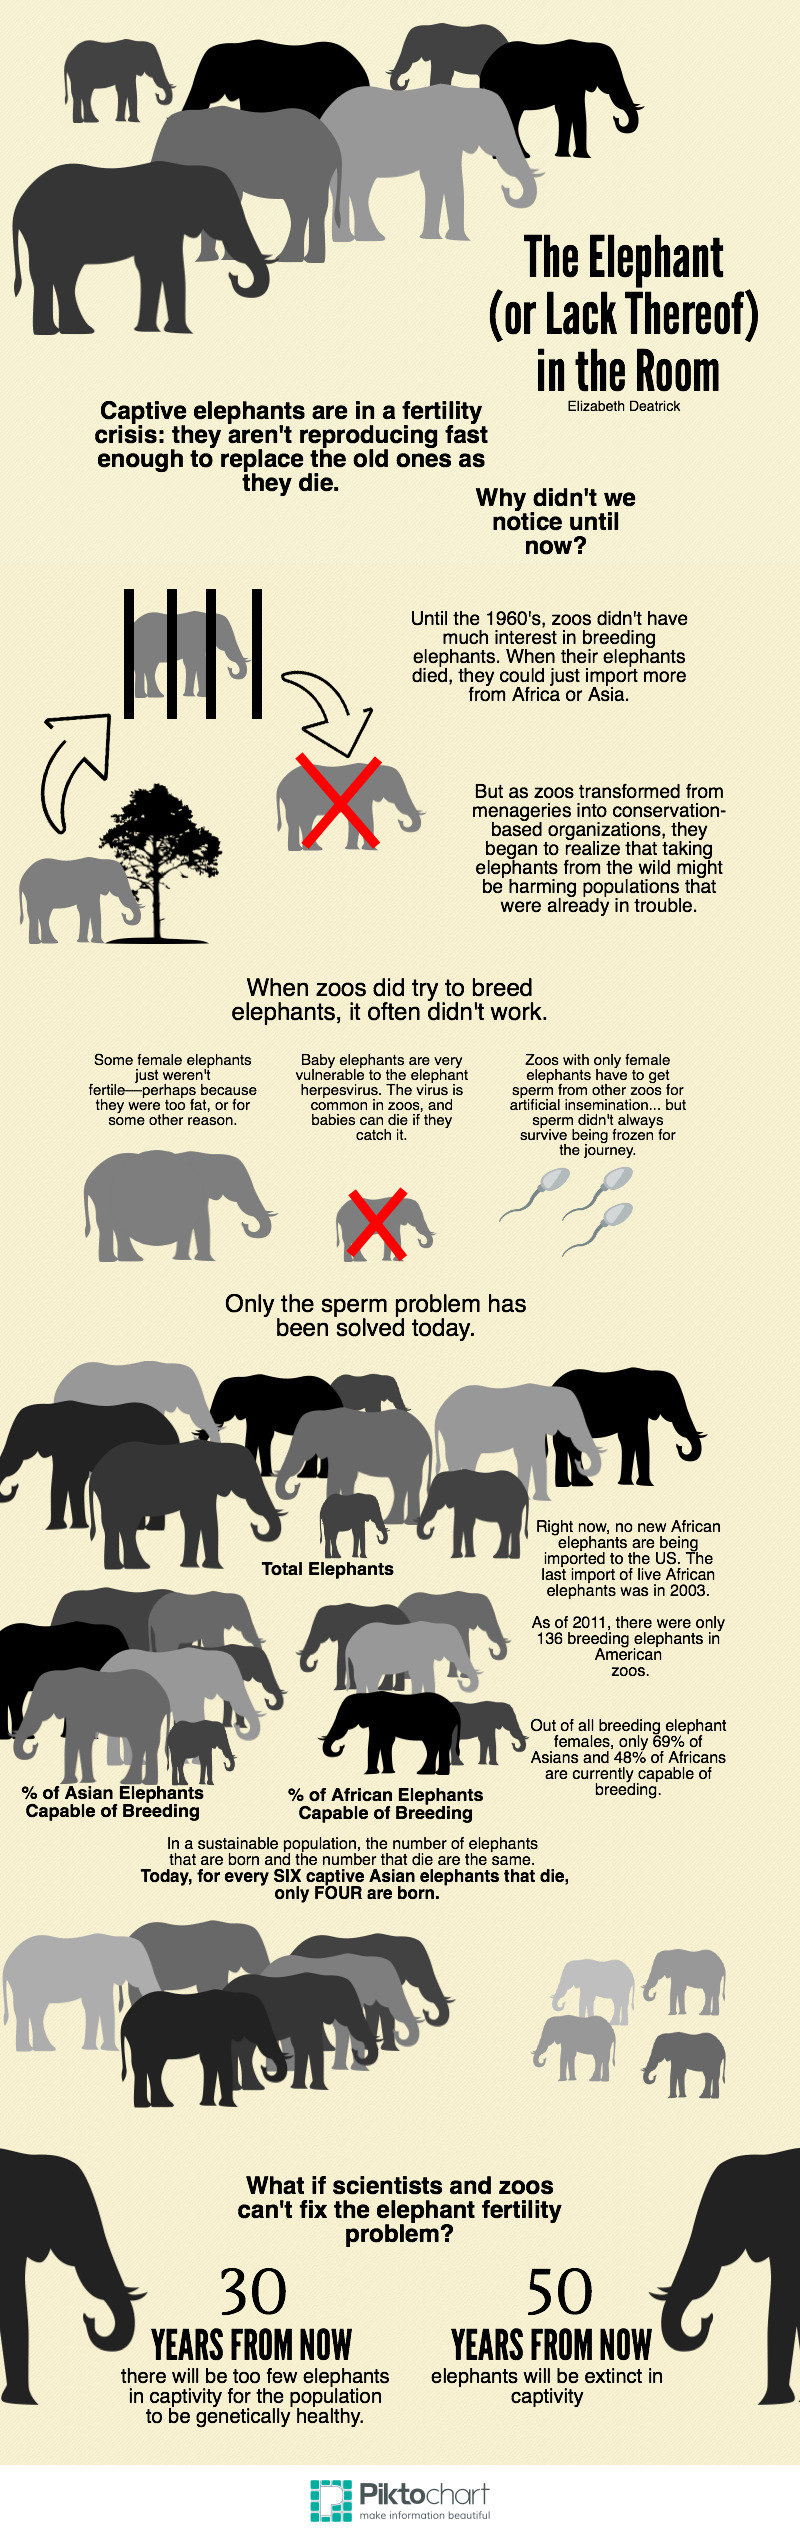 Infographic by Elizabeth Deatrick